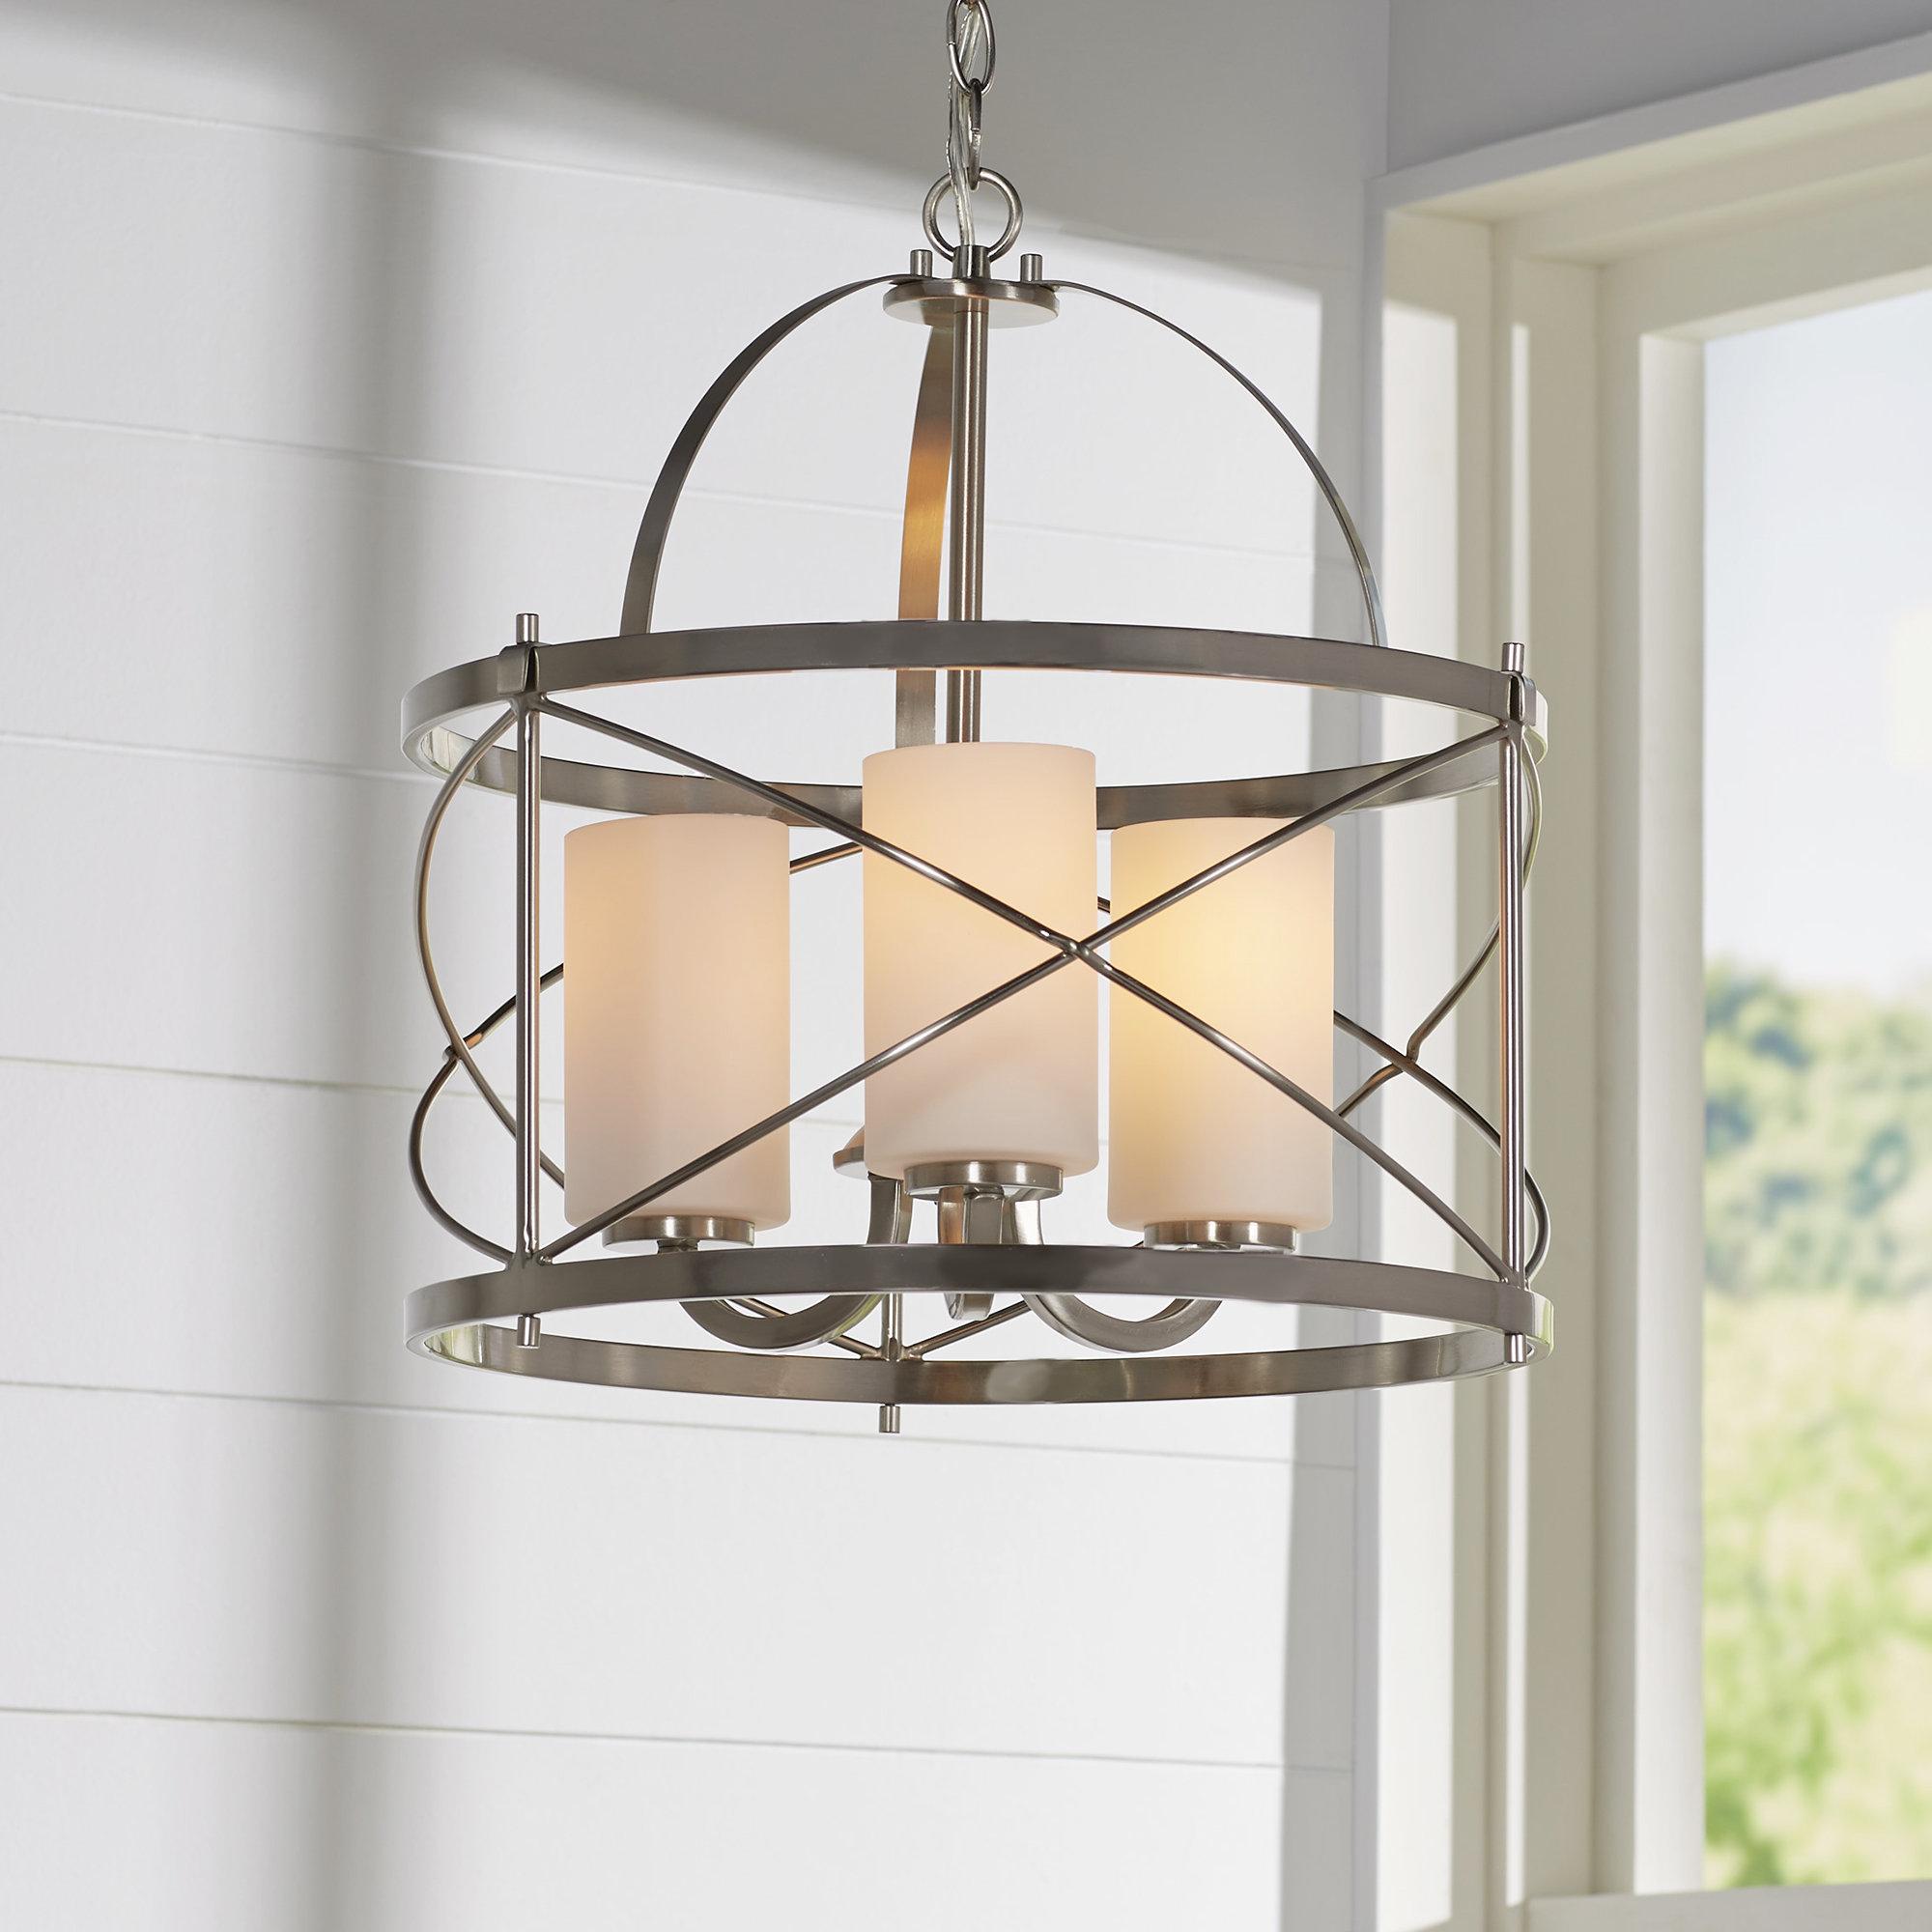 Armande 4 Light Lantern Drum Pendants Regarding 2019 Darby Home Co Farrier 3 Light Lantern Drum Pendant (View 4 of 25)